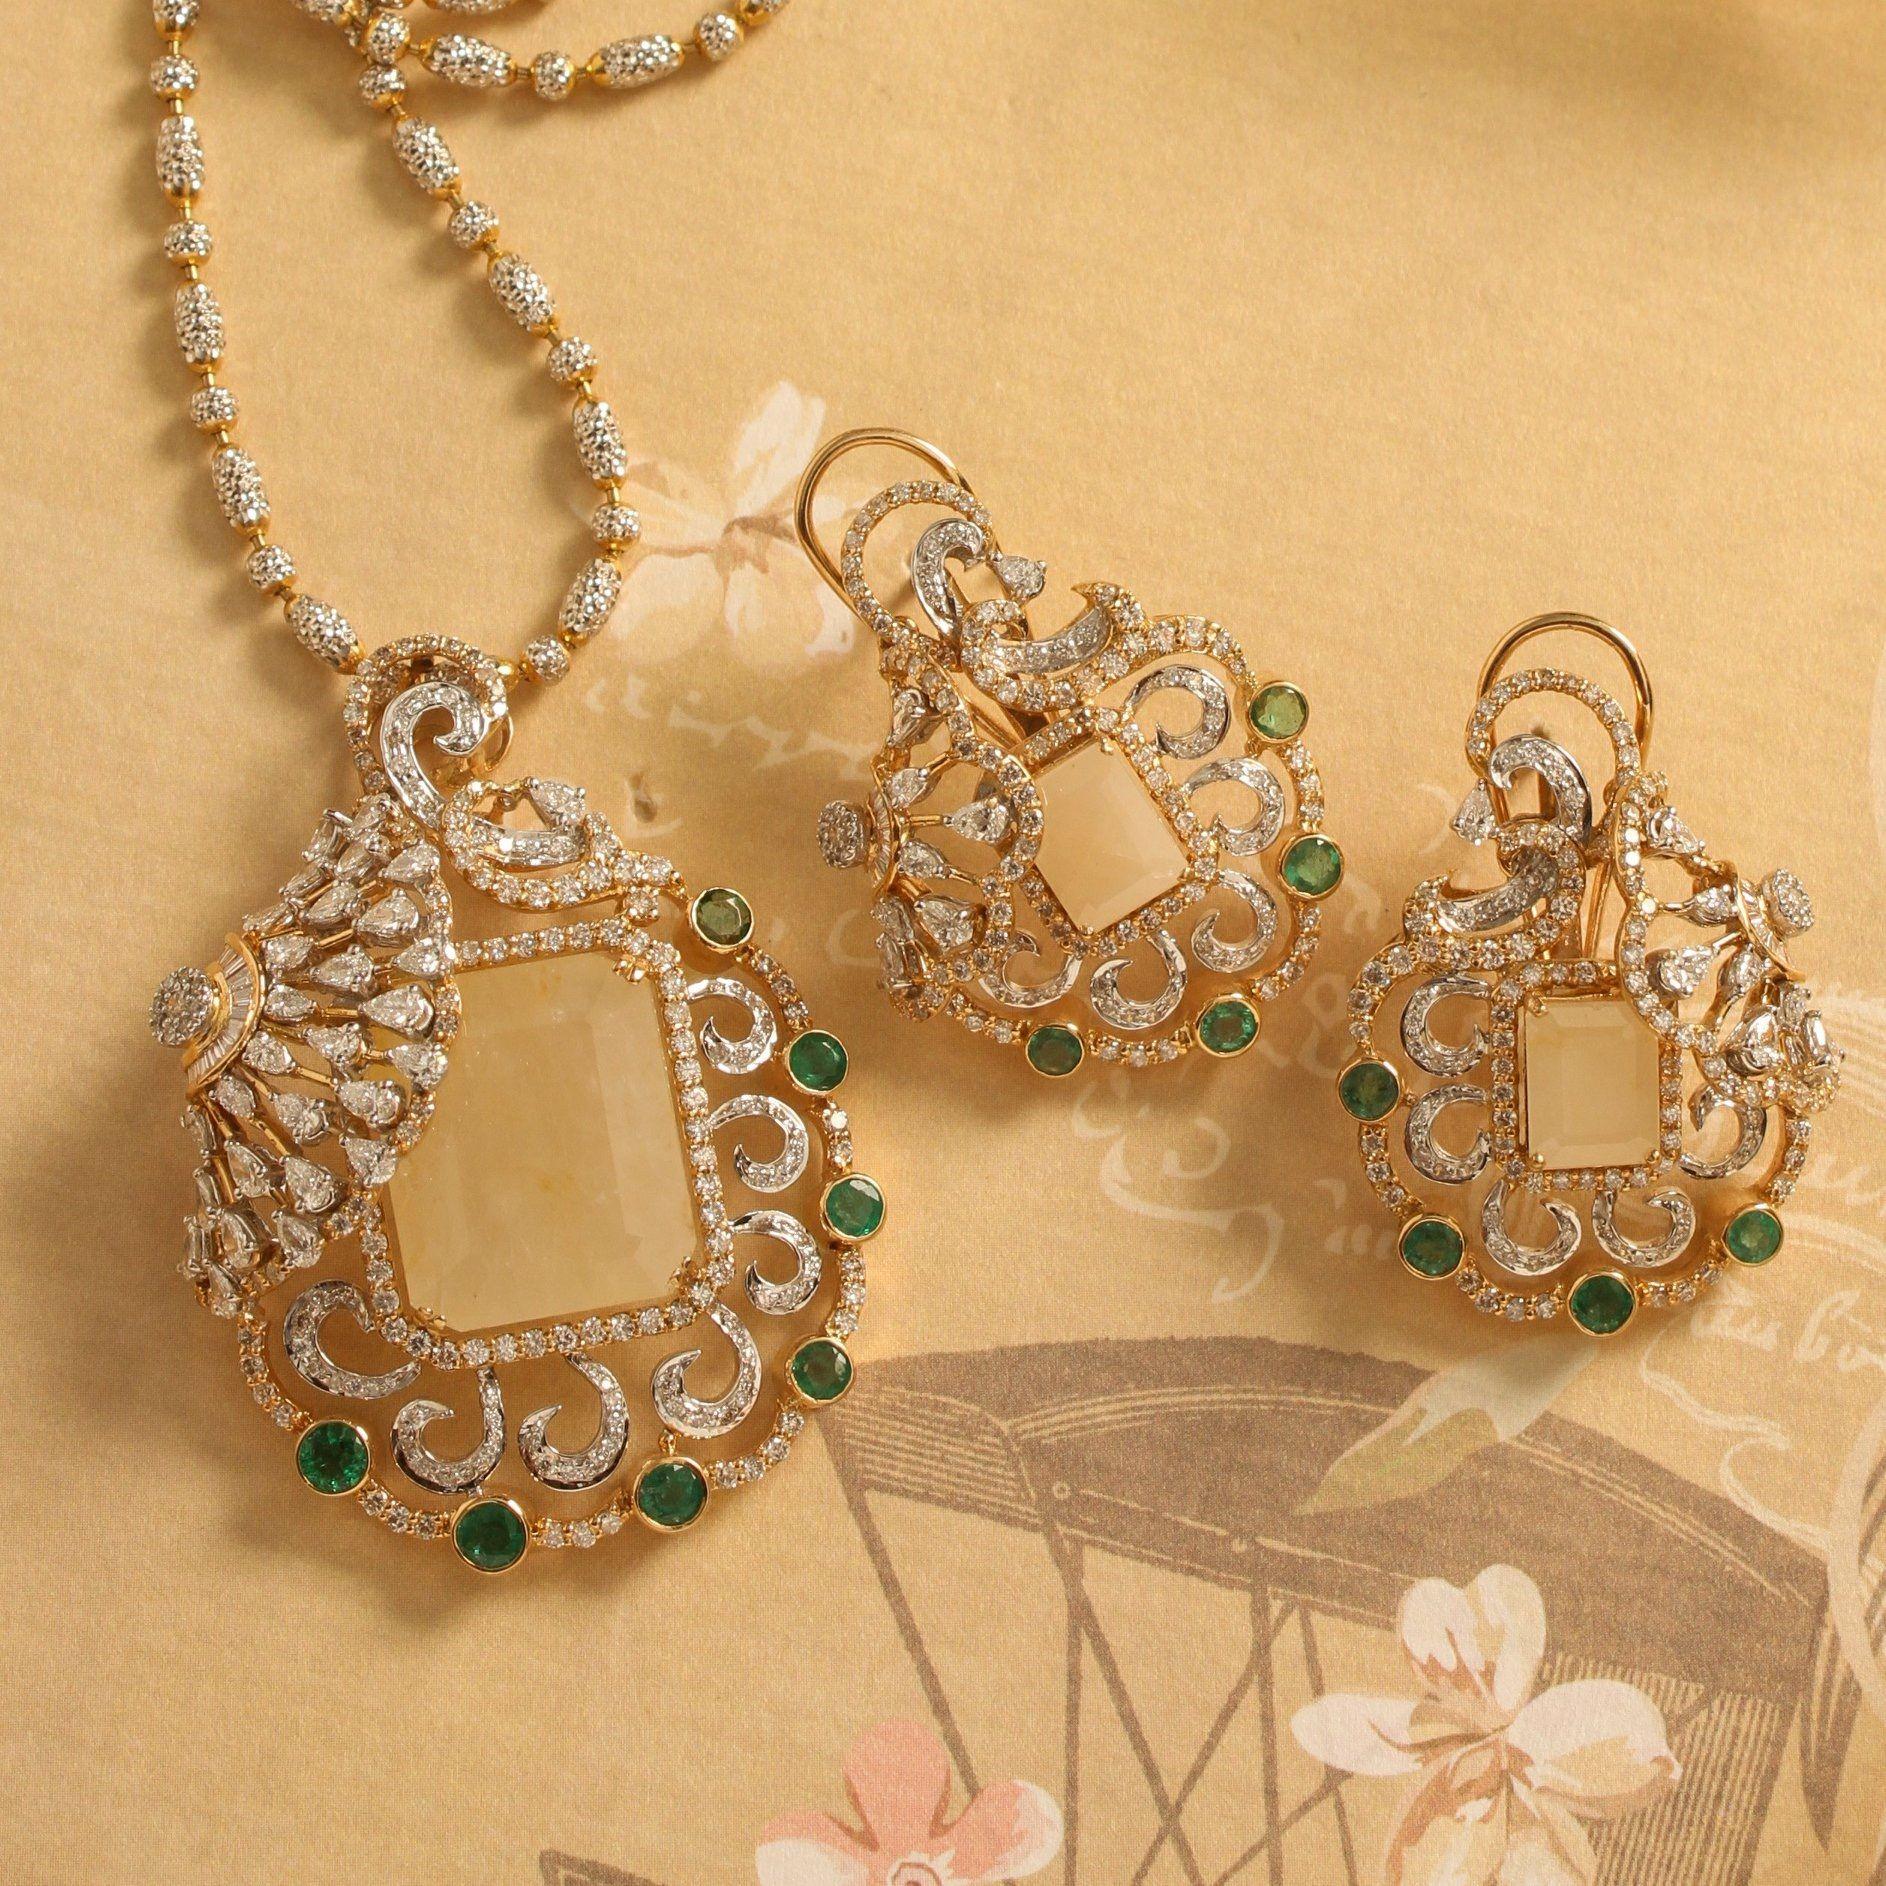 Pin by akash goyal on diamond pinterest jewel diamond and pendants